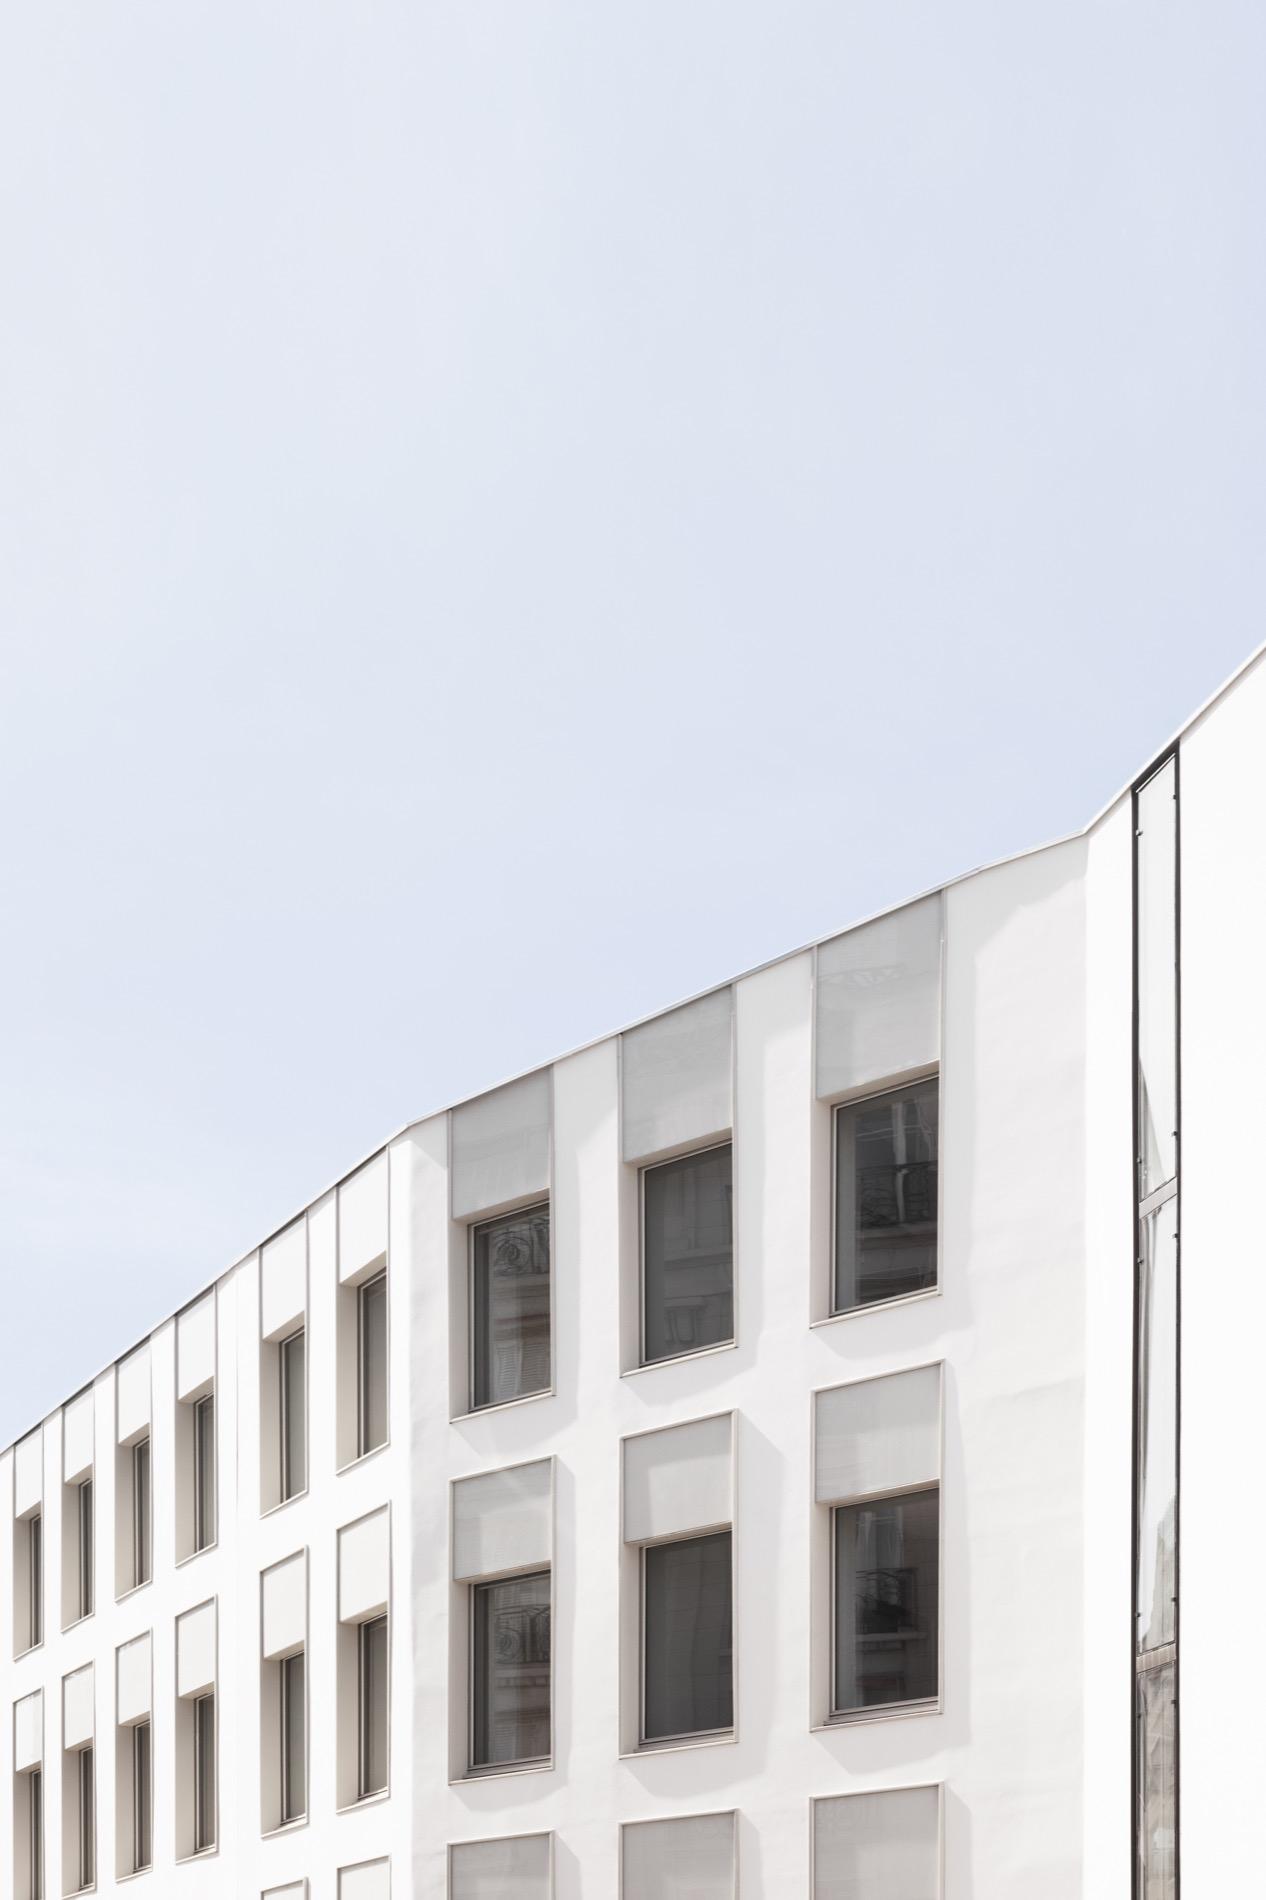 LOWENDAL_6_façade sur rue